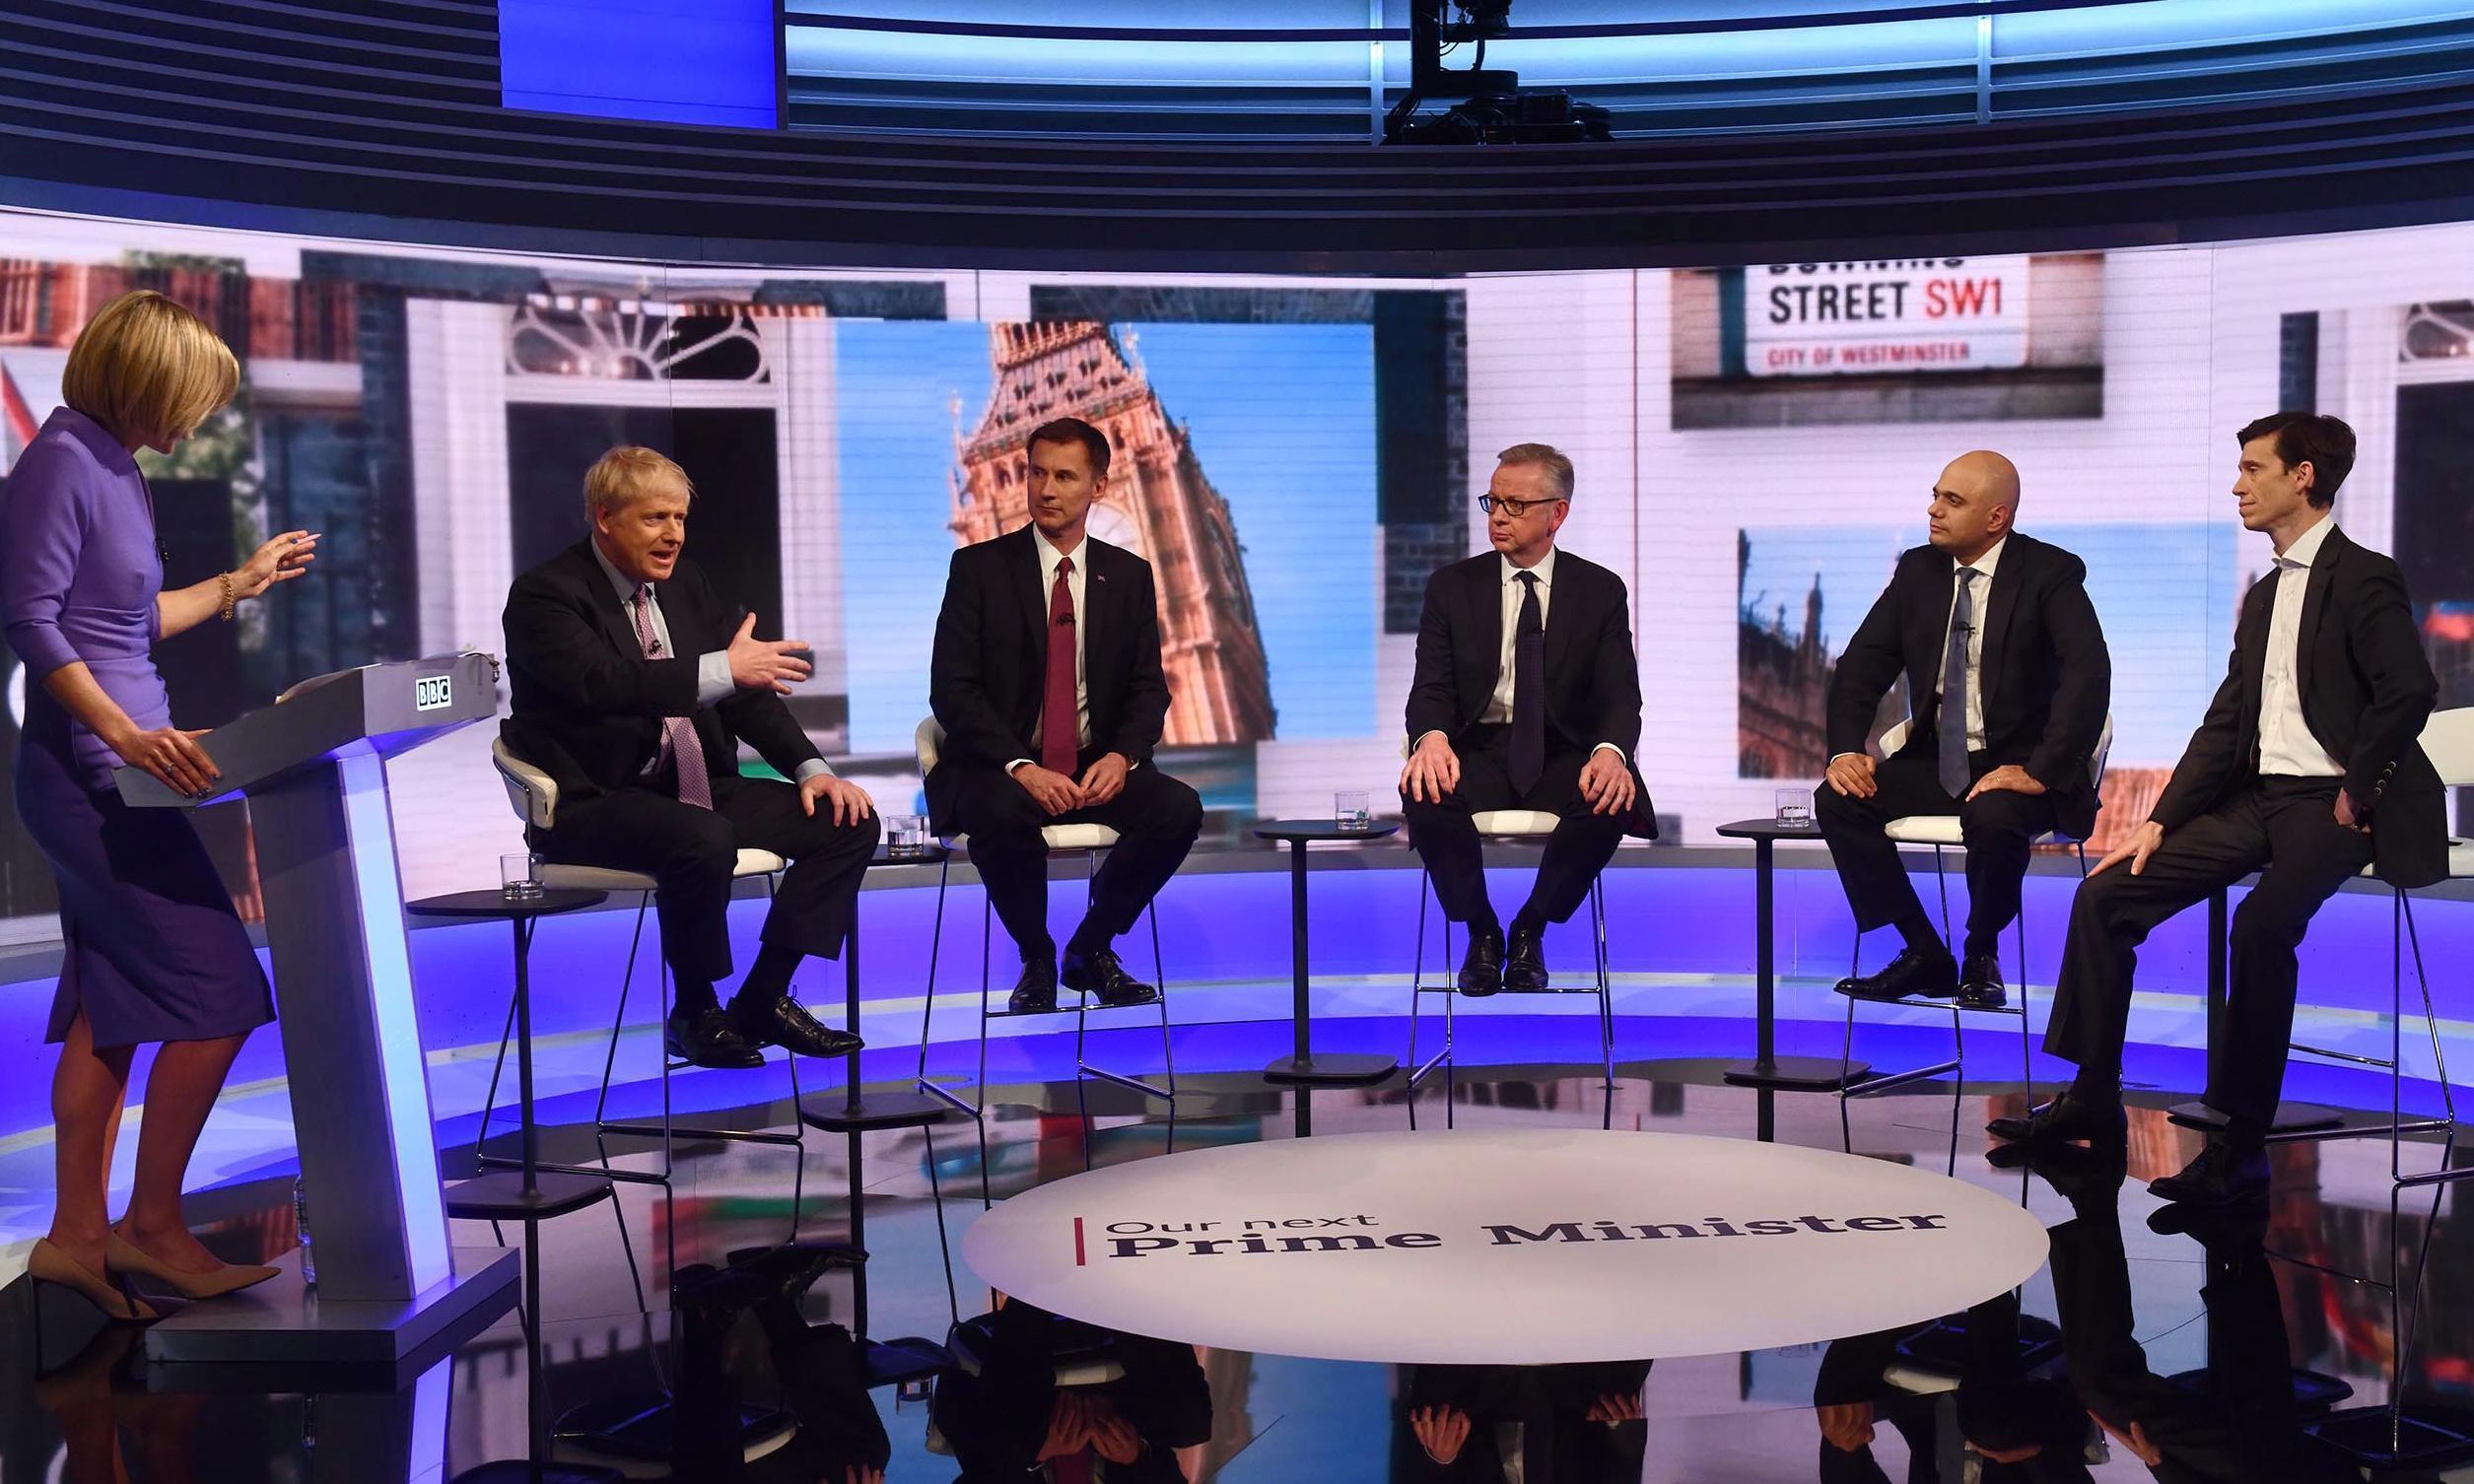 BBC to consider increasing vetting after Tory leadership debate